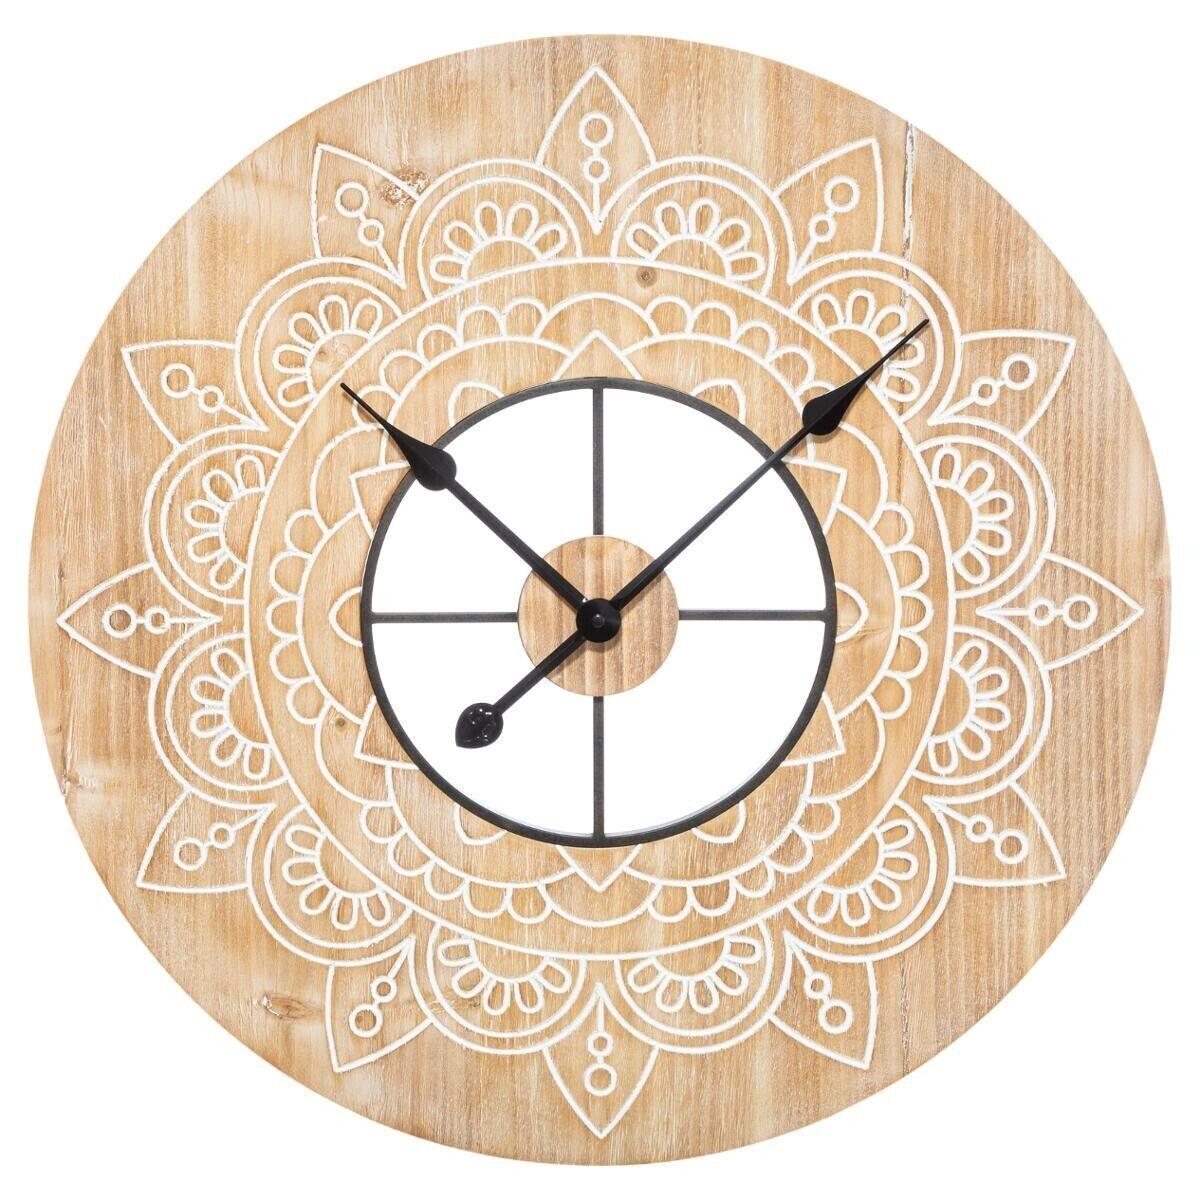 Atmosphera Horloge gravée en bois D60 cm